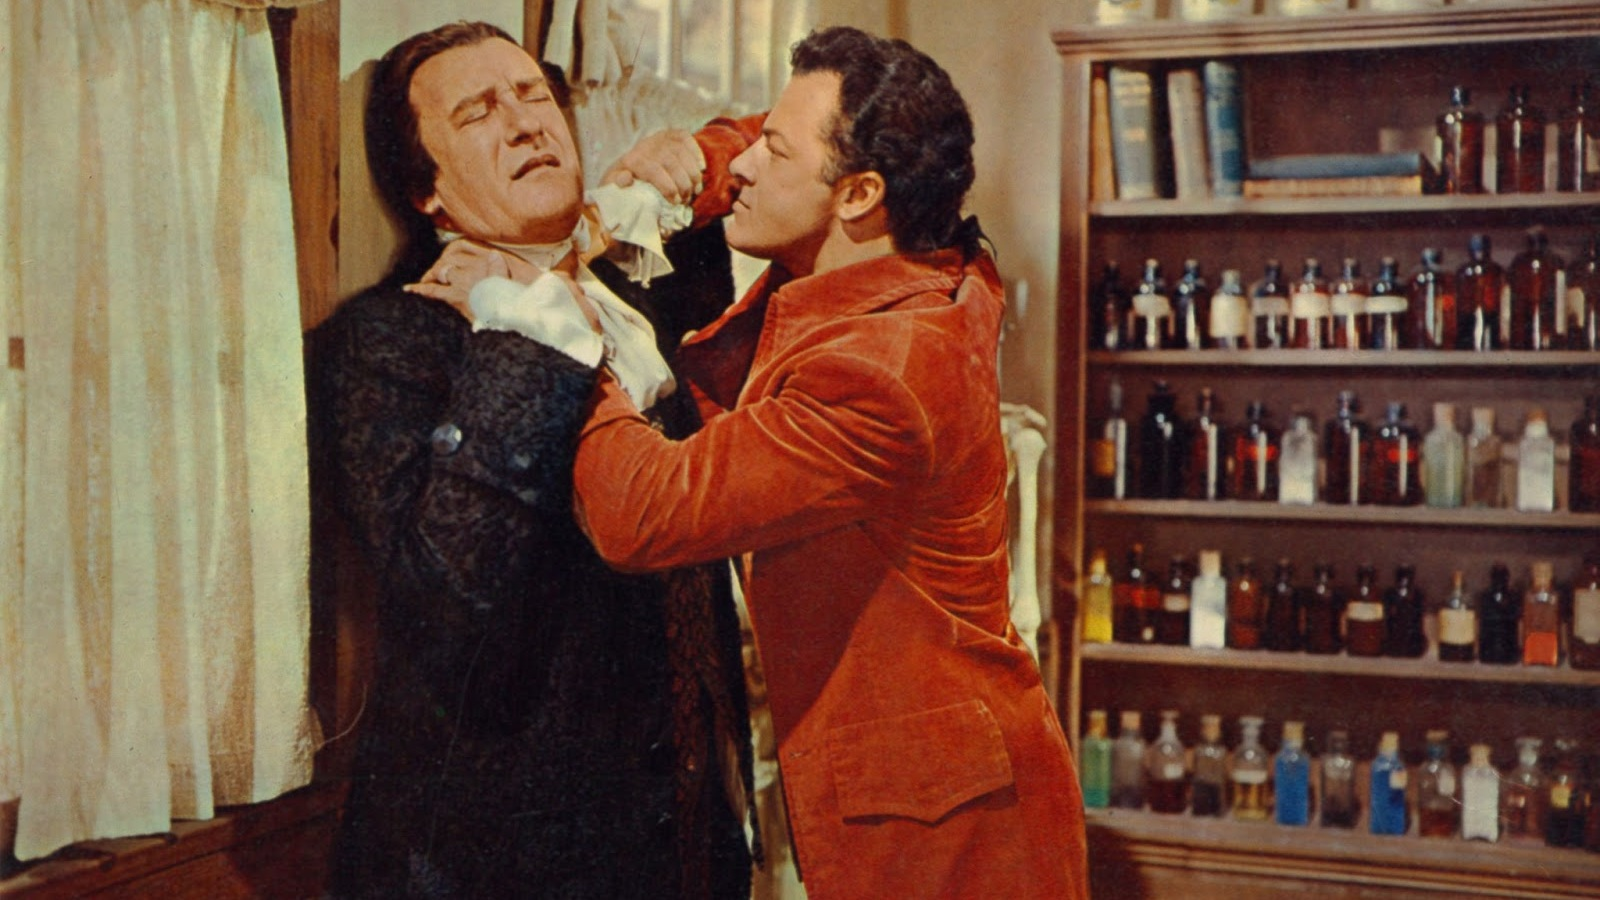 #4) The Scarlet Coat - (1955 - dir. John Sturges)